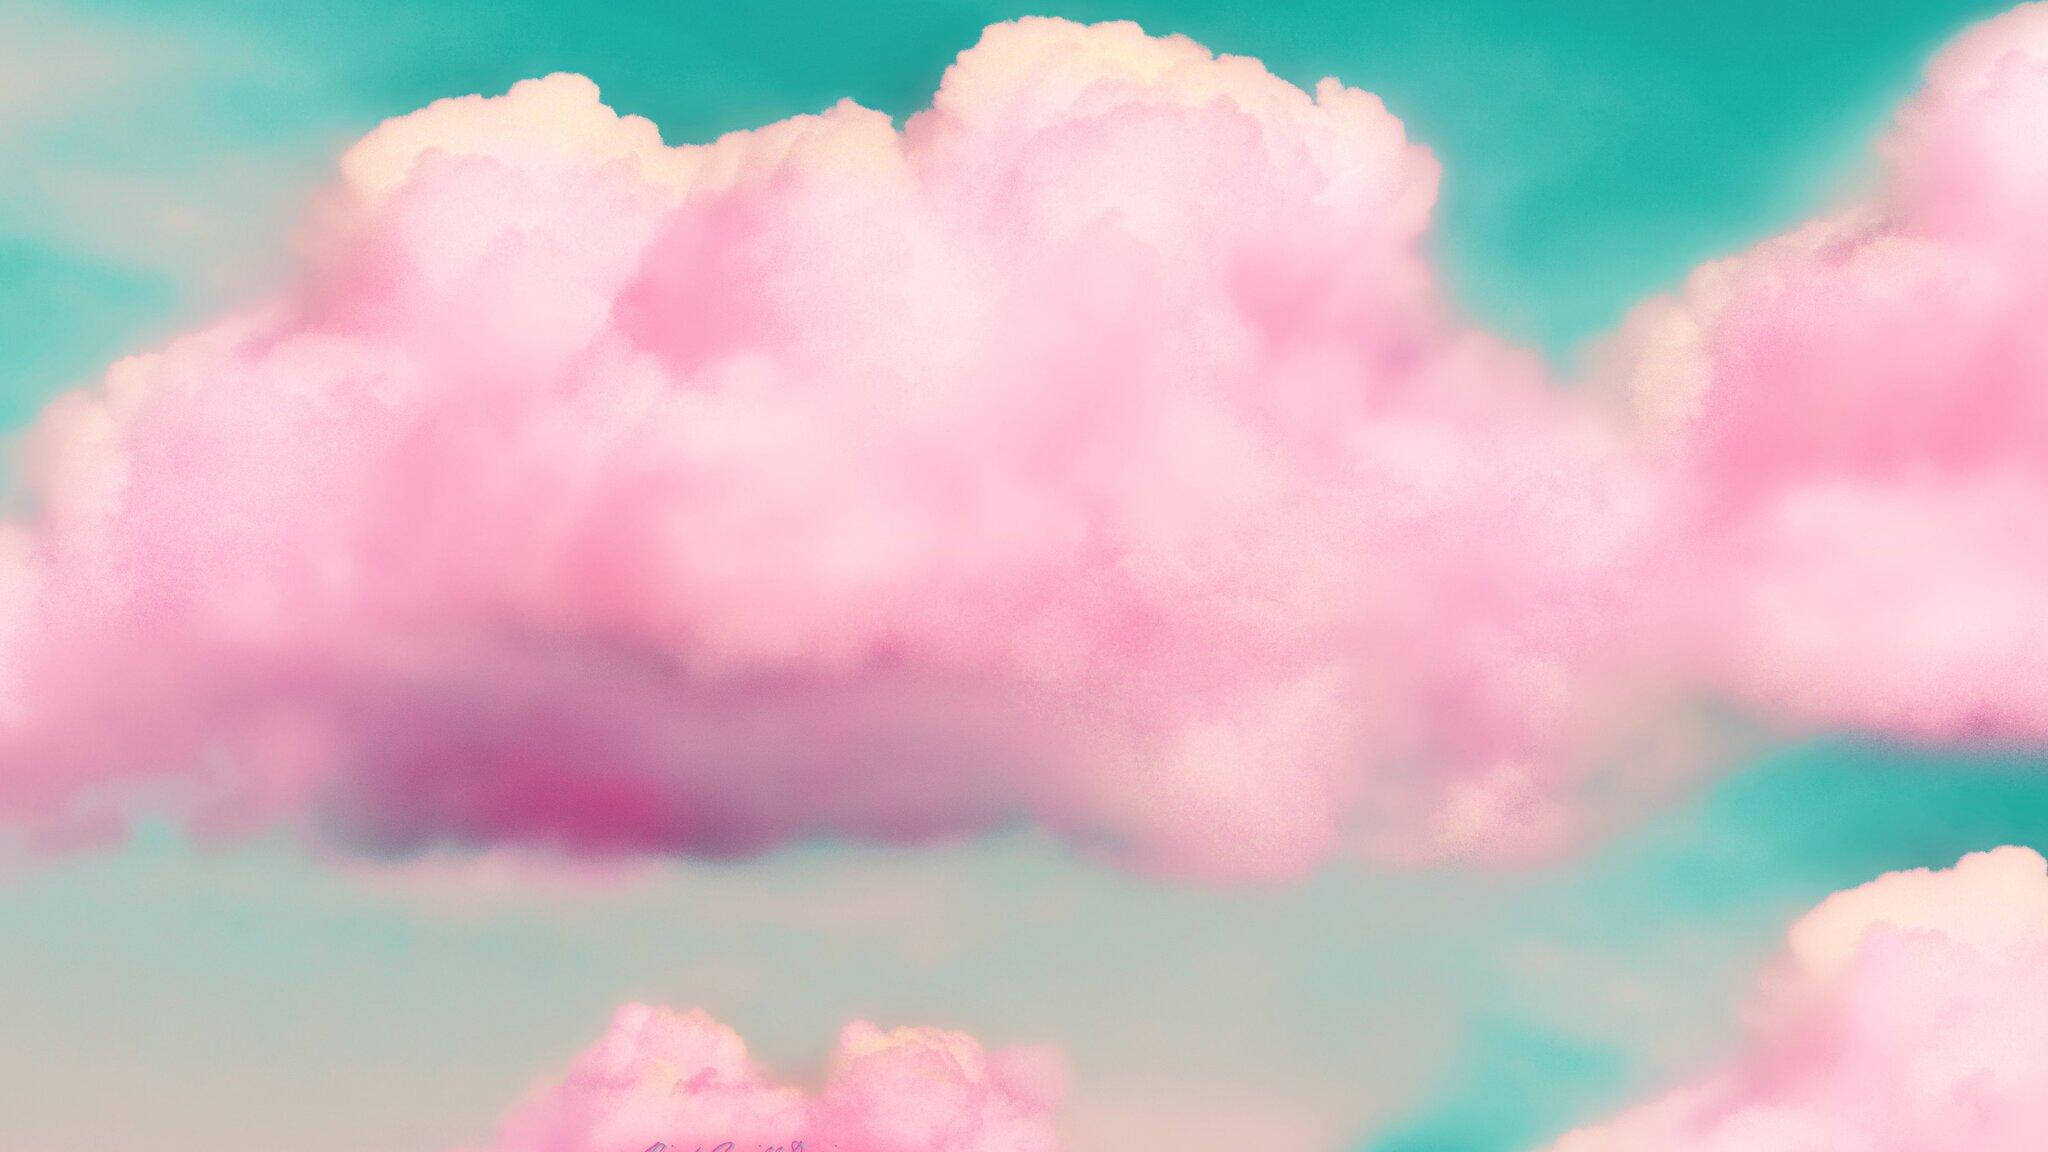 2048x1152 pink clouds 3d 2048x1152 resolution hd 4k - Pink wallpaper 4k ...